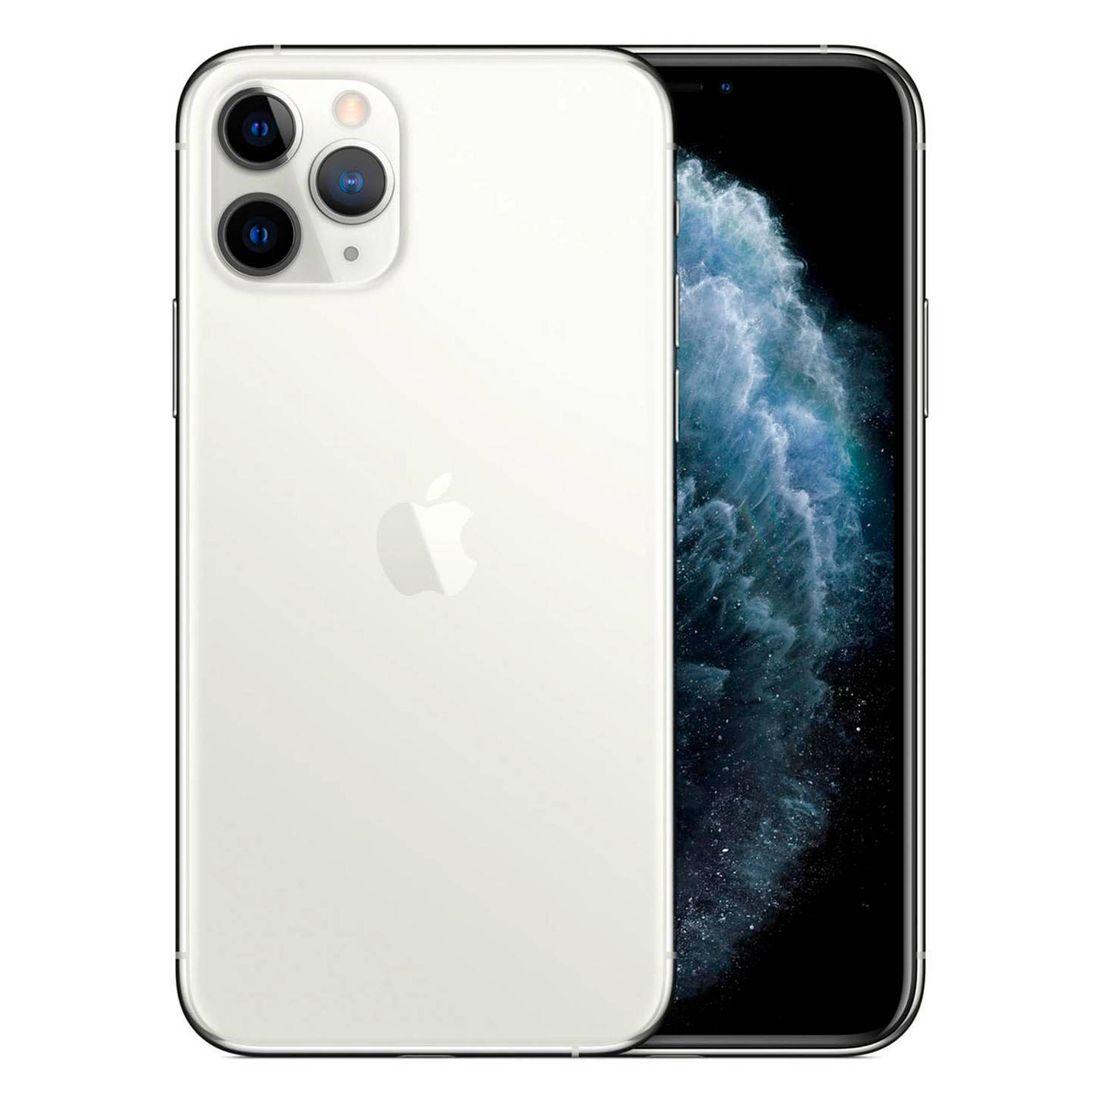 Apple iPhone 11 Pro 256GB - Silver